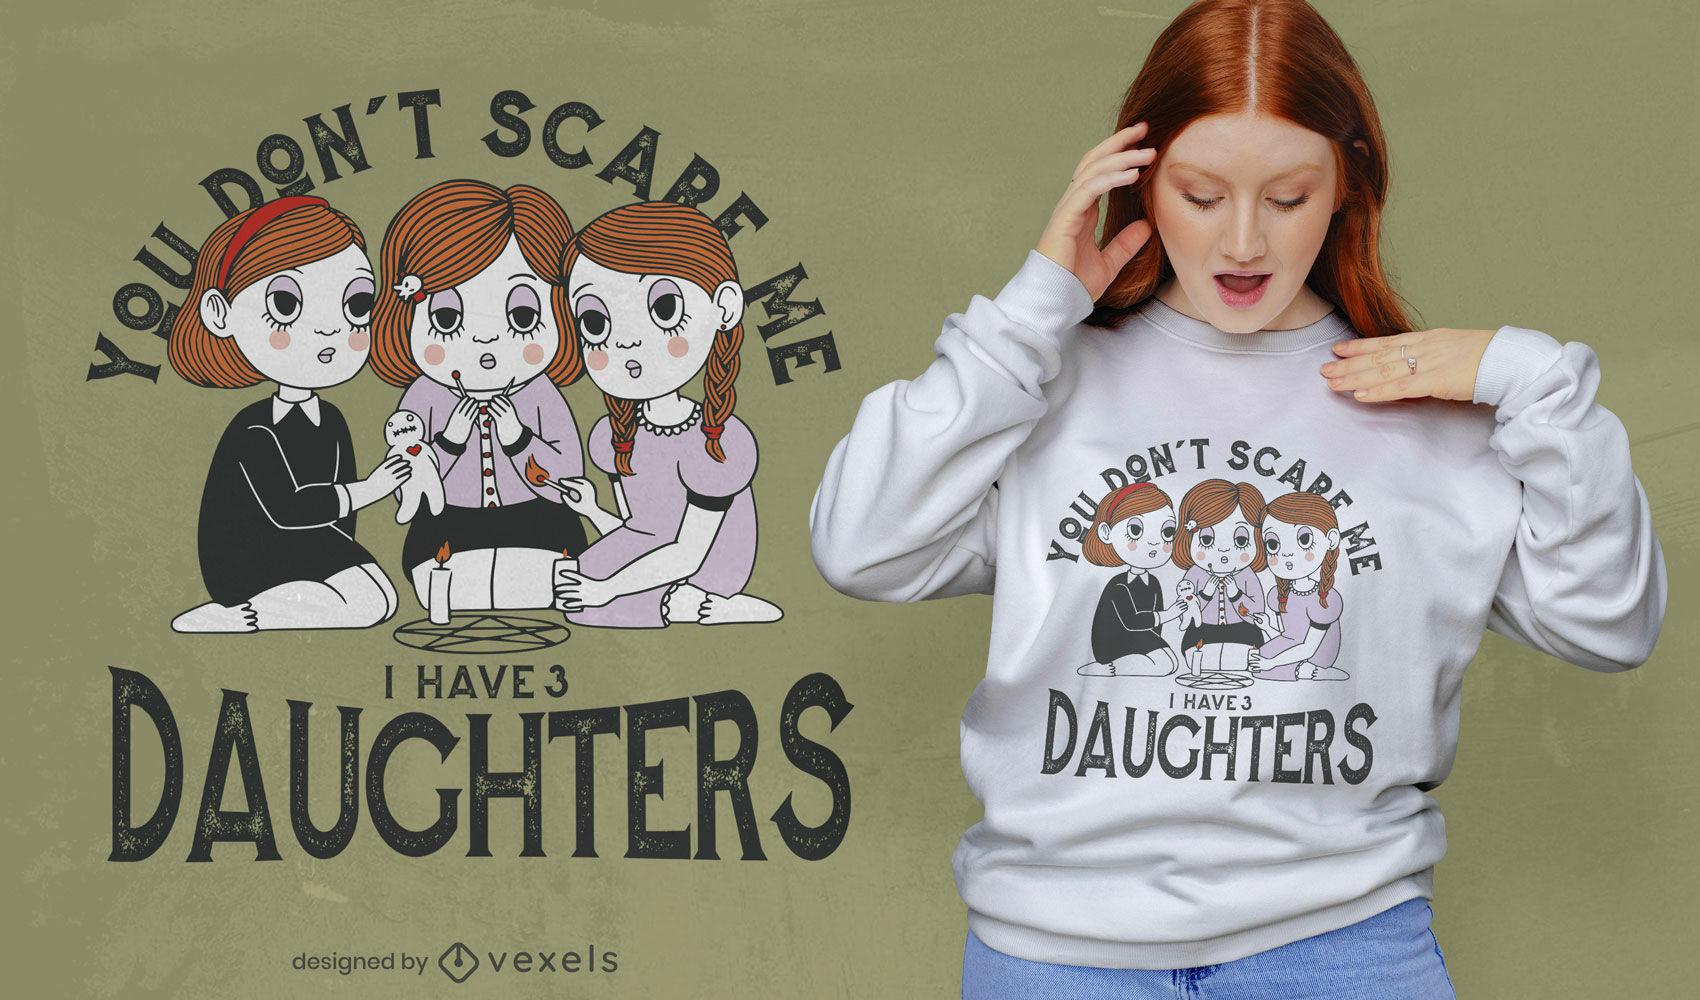 Gruselige Mädchen zitieren T-Shirt-Design